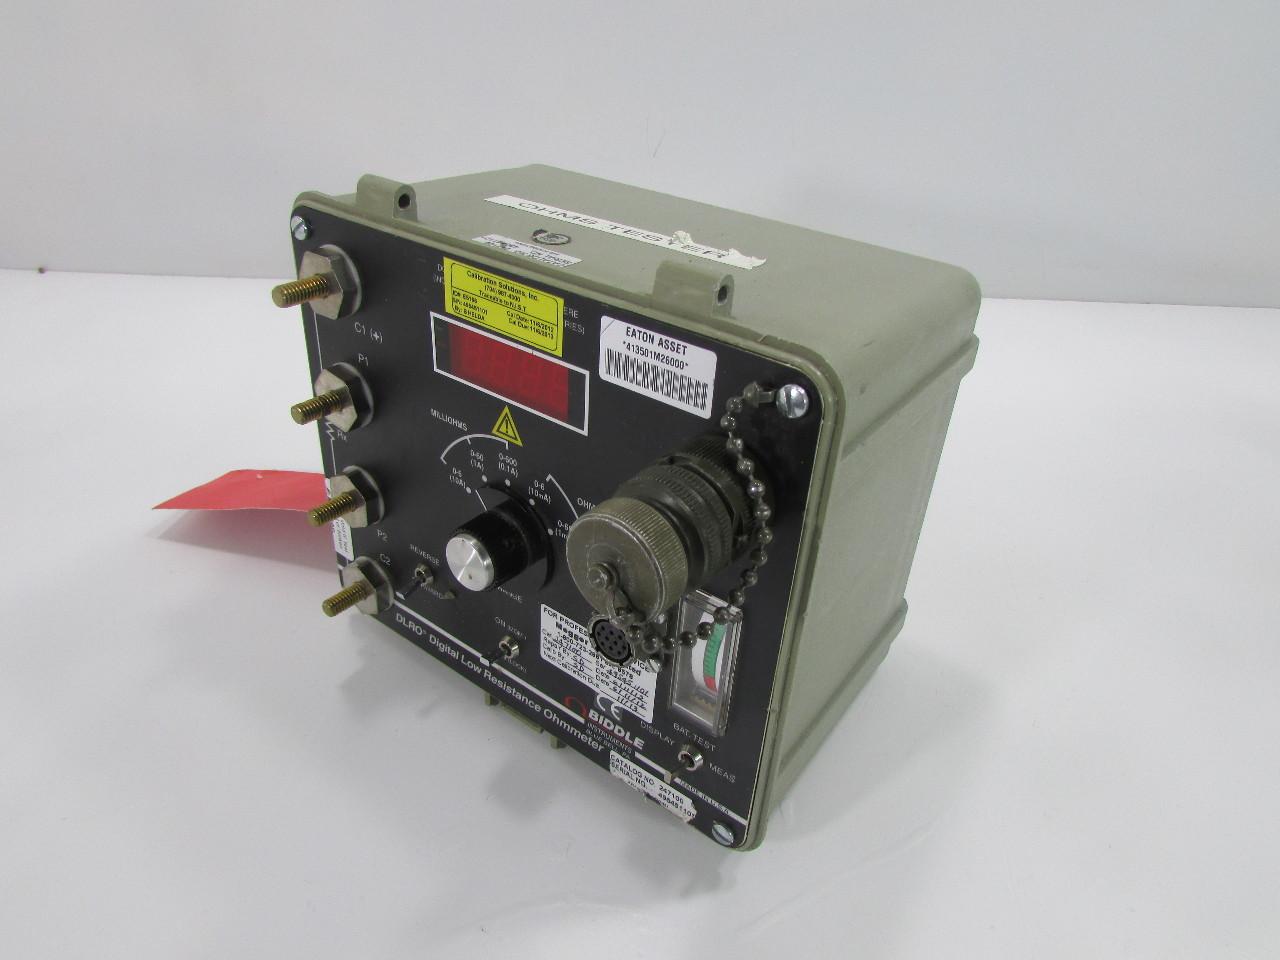 Digital Low Resistance Ohmmeters : Biddle dlro digital low resistance ohmmeter